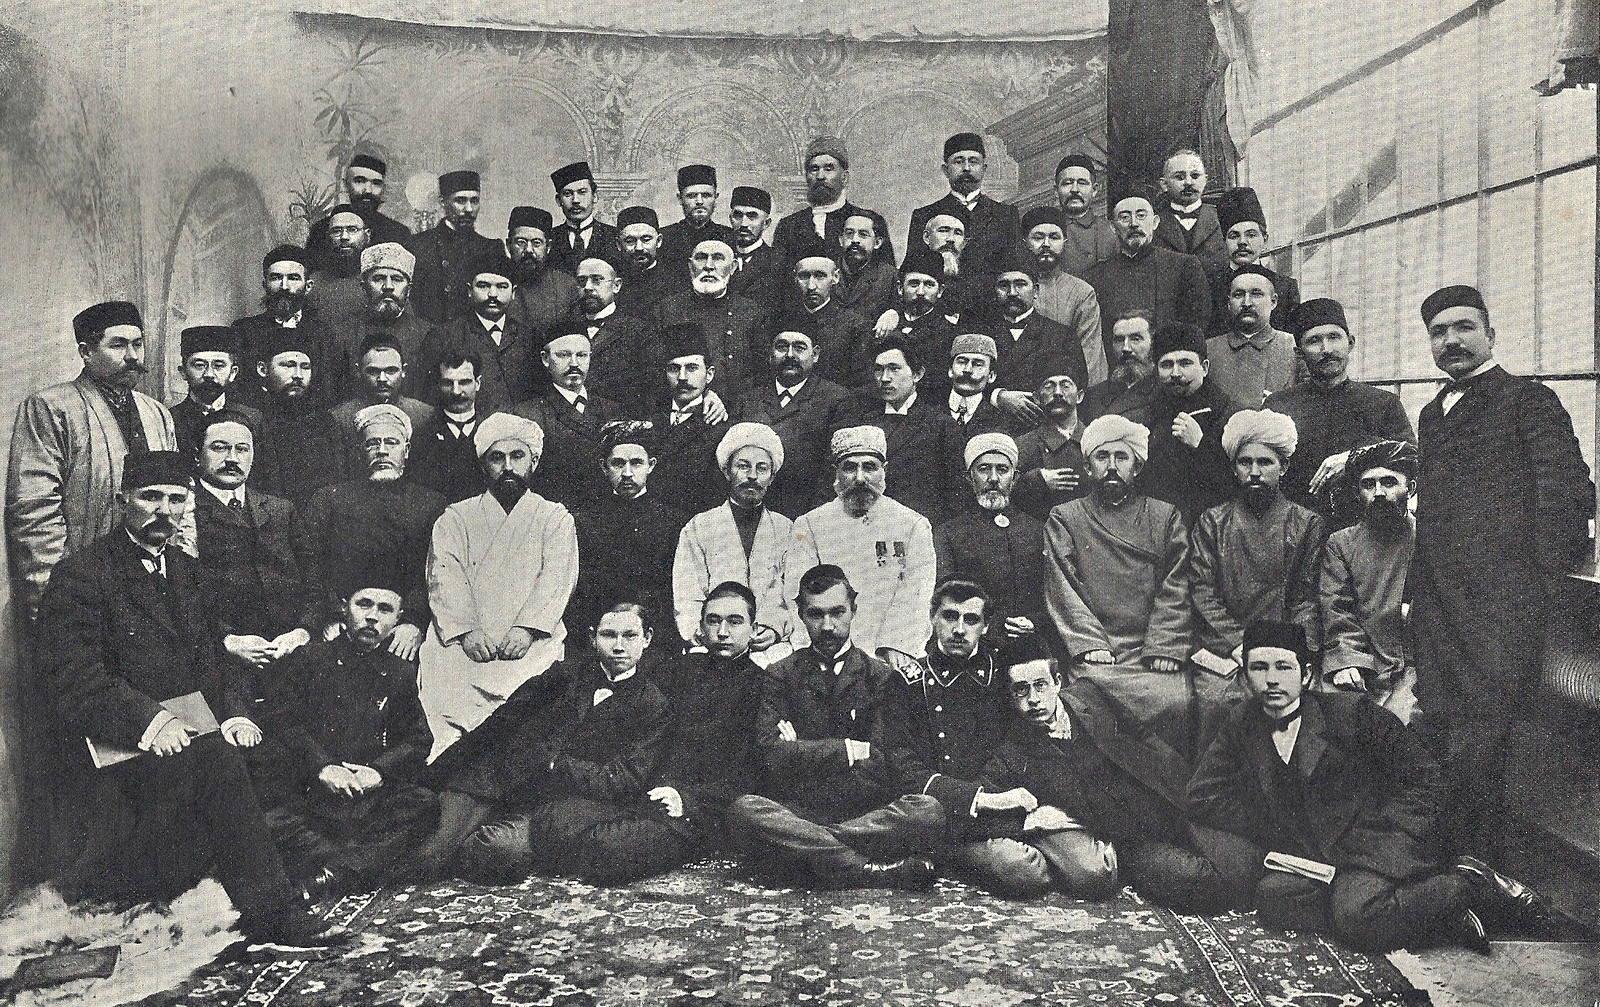 1906. Мусульманский съезд в Санкт-Петербурге